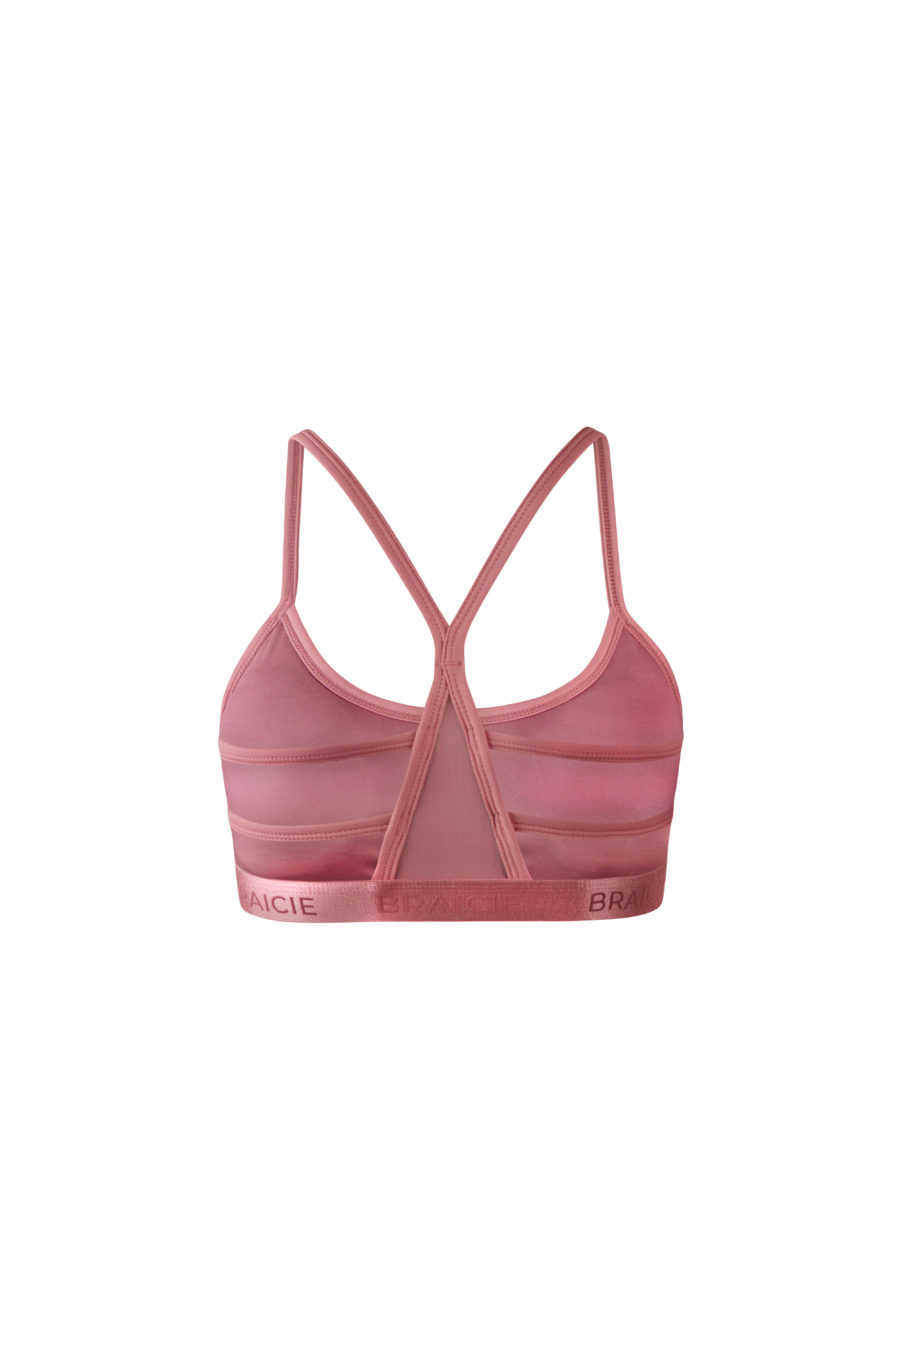 Funktionaler Damen Sport-BH rosa für Fitnesstraining oder Yoga